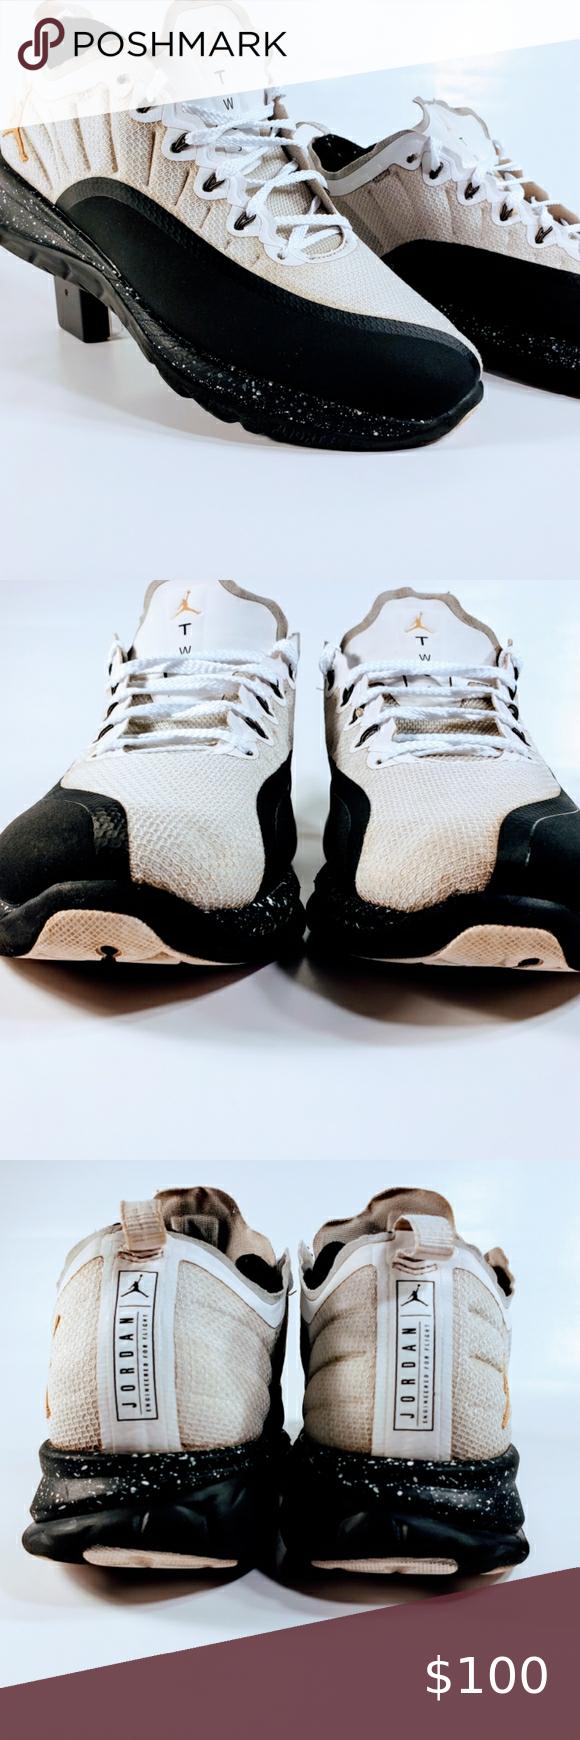 Nike Air Jordan flight flex trainers sz 8 | Air jordans, Nike air ...